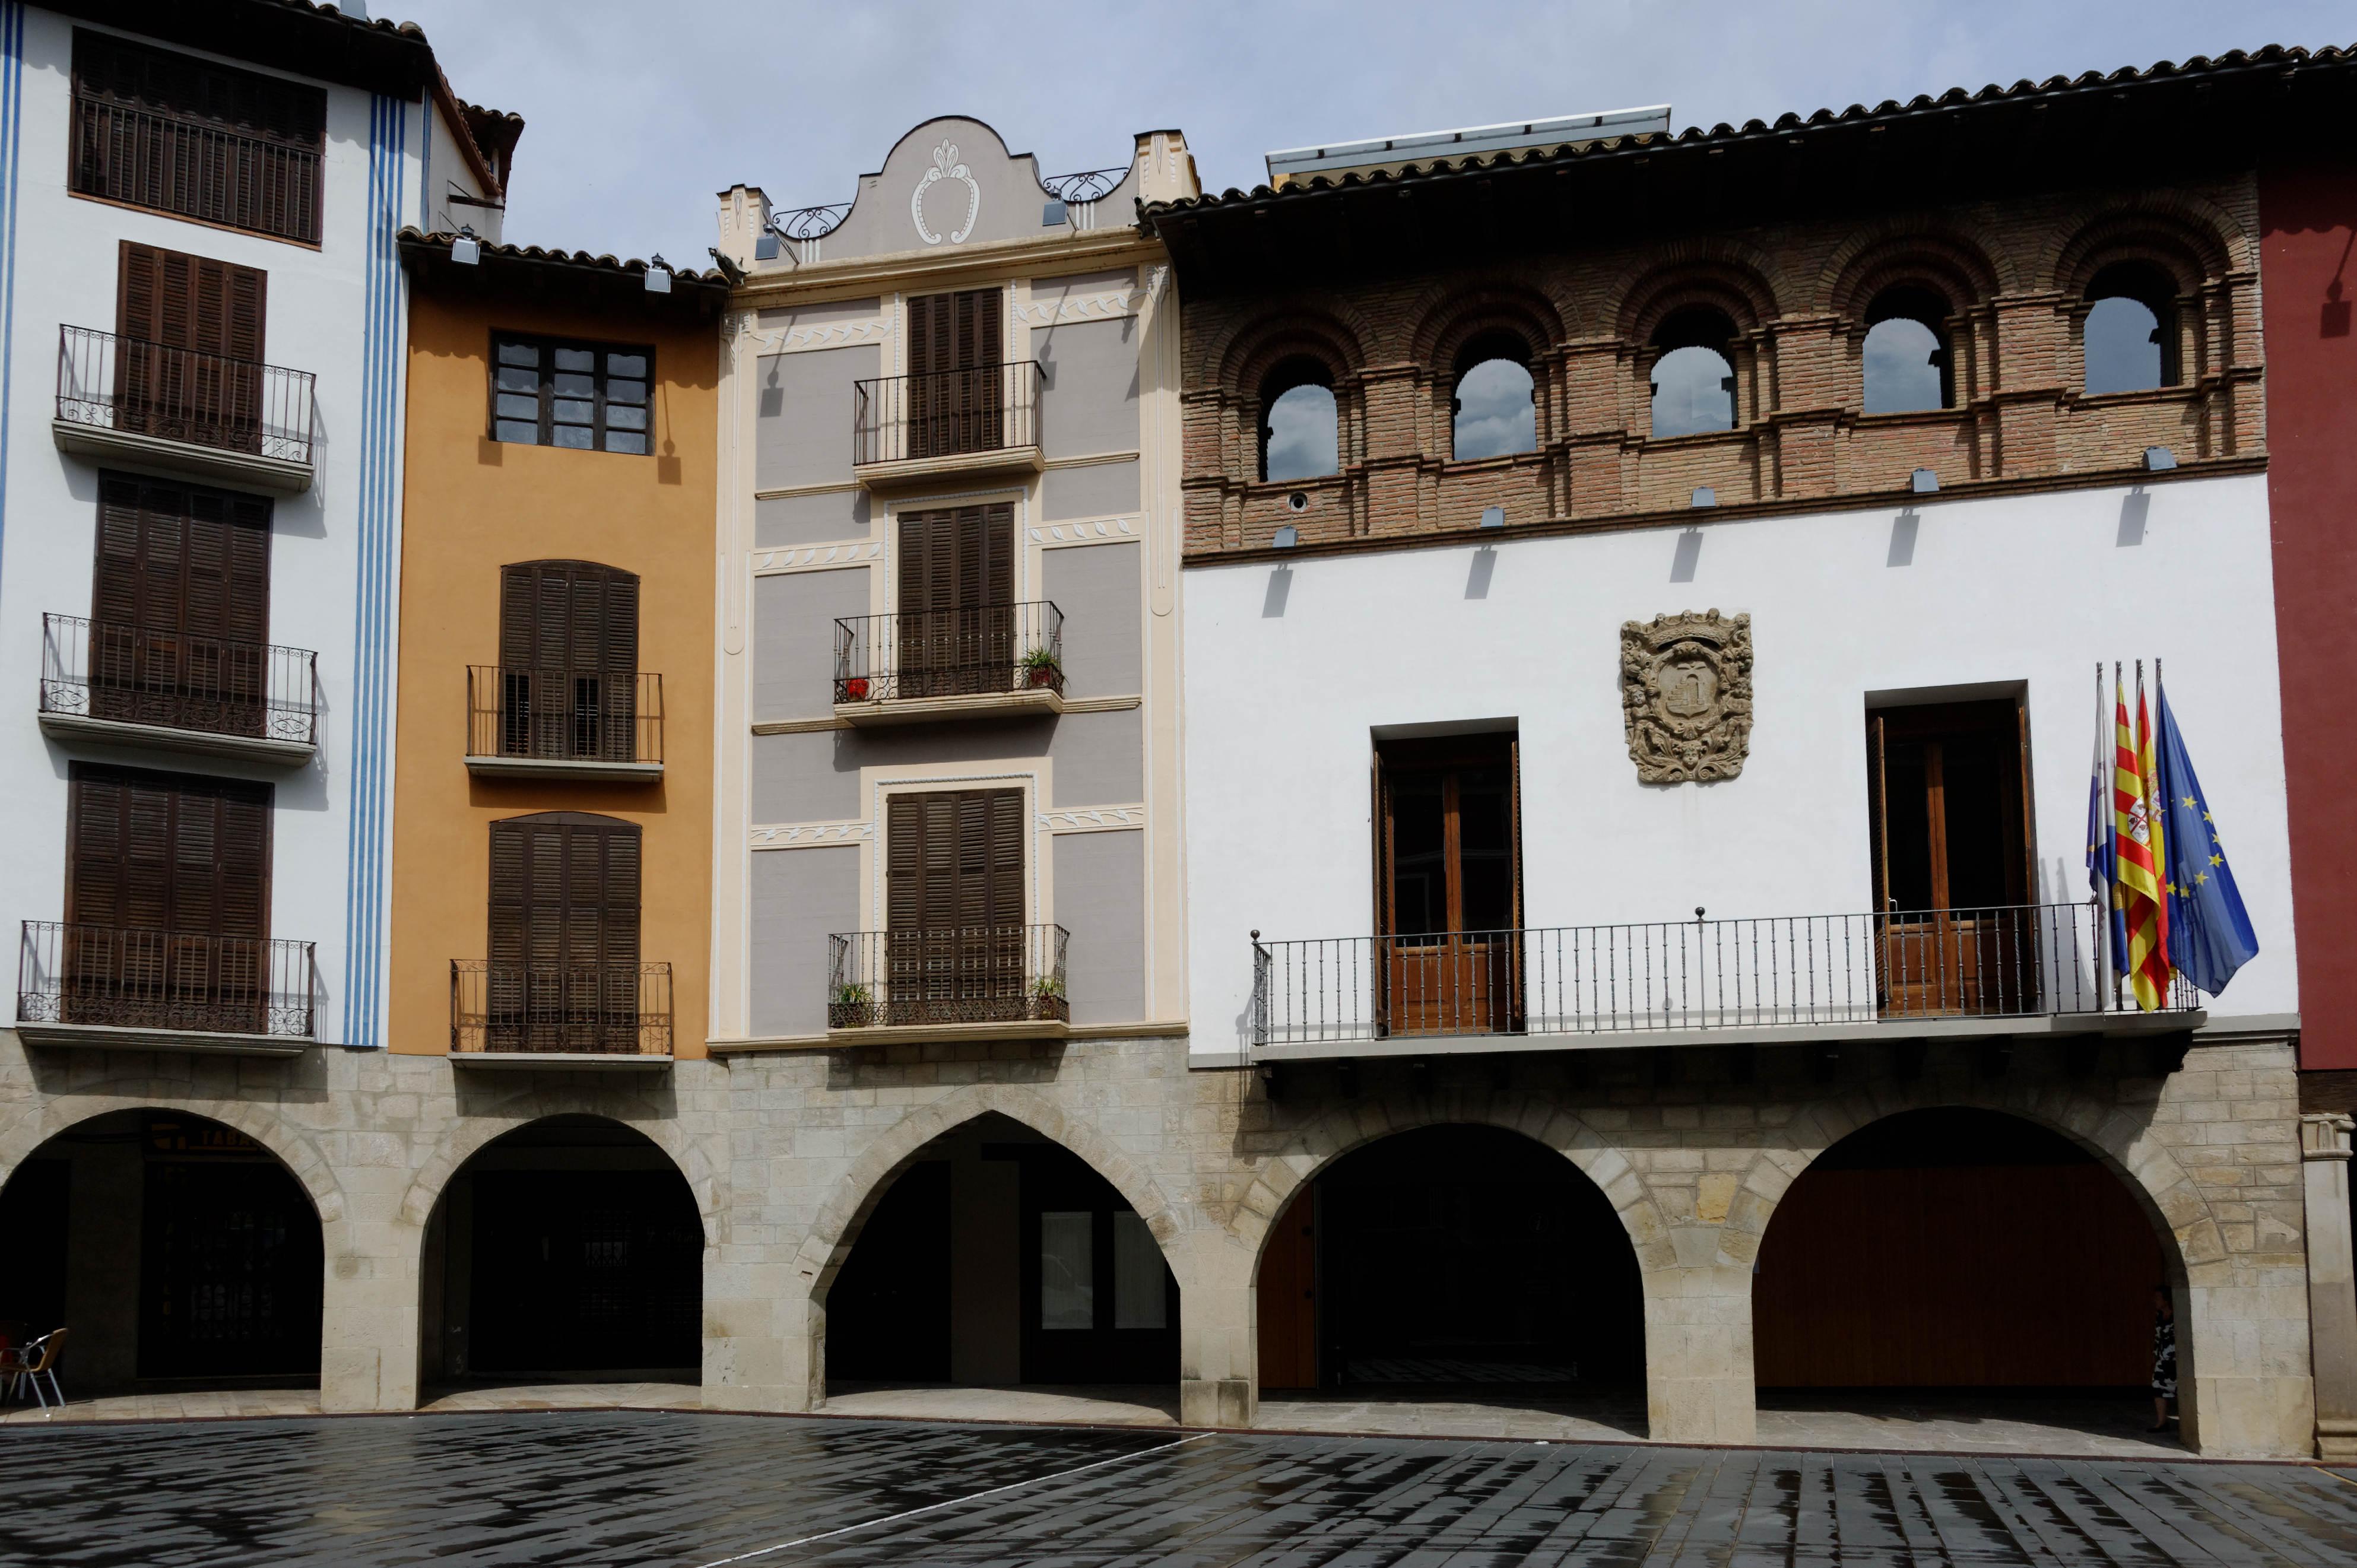 4325_Graus (Aragon)